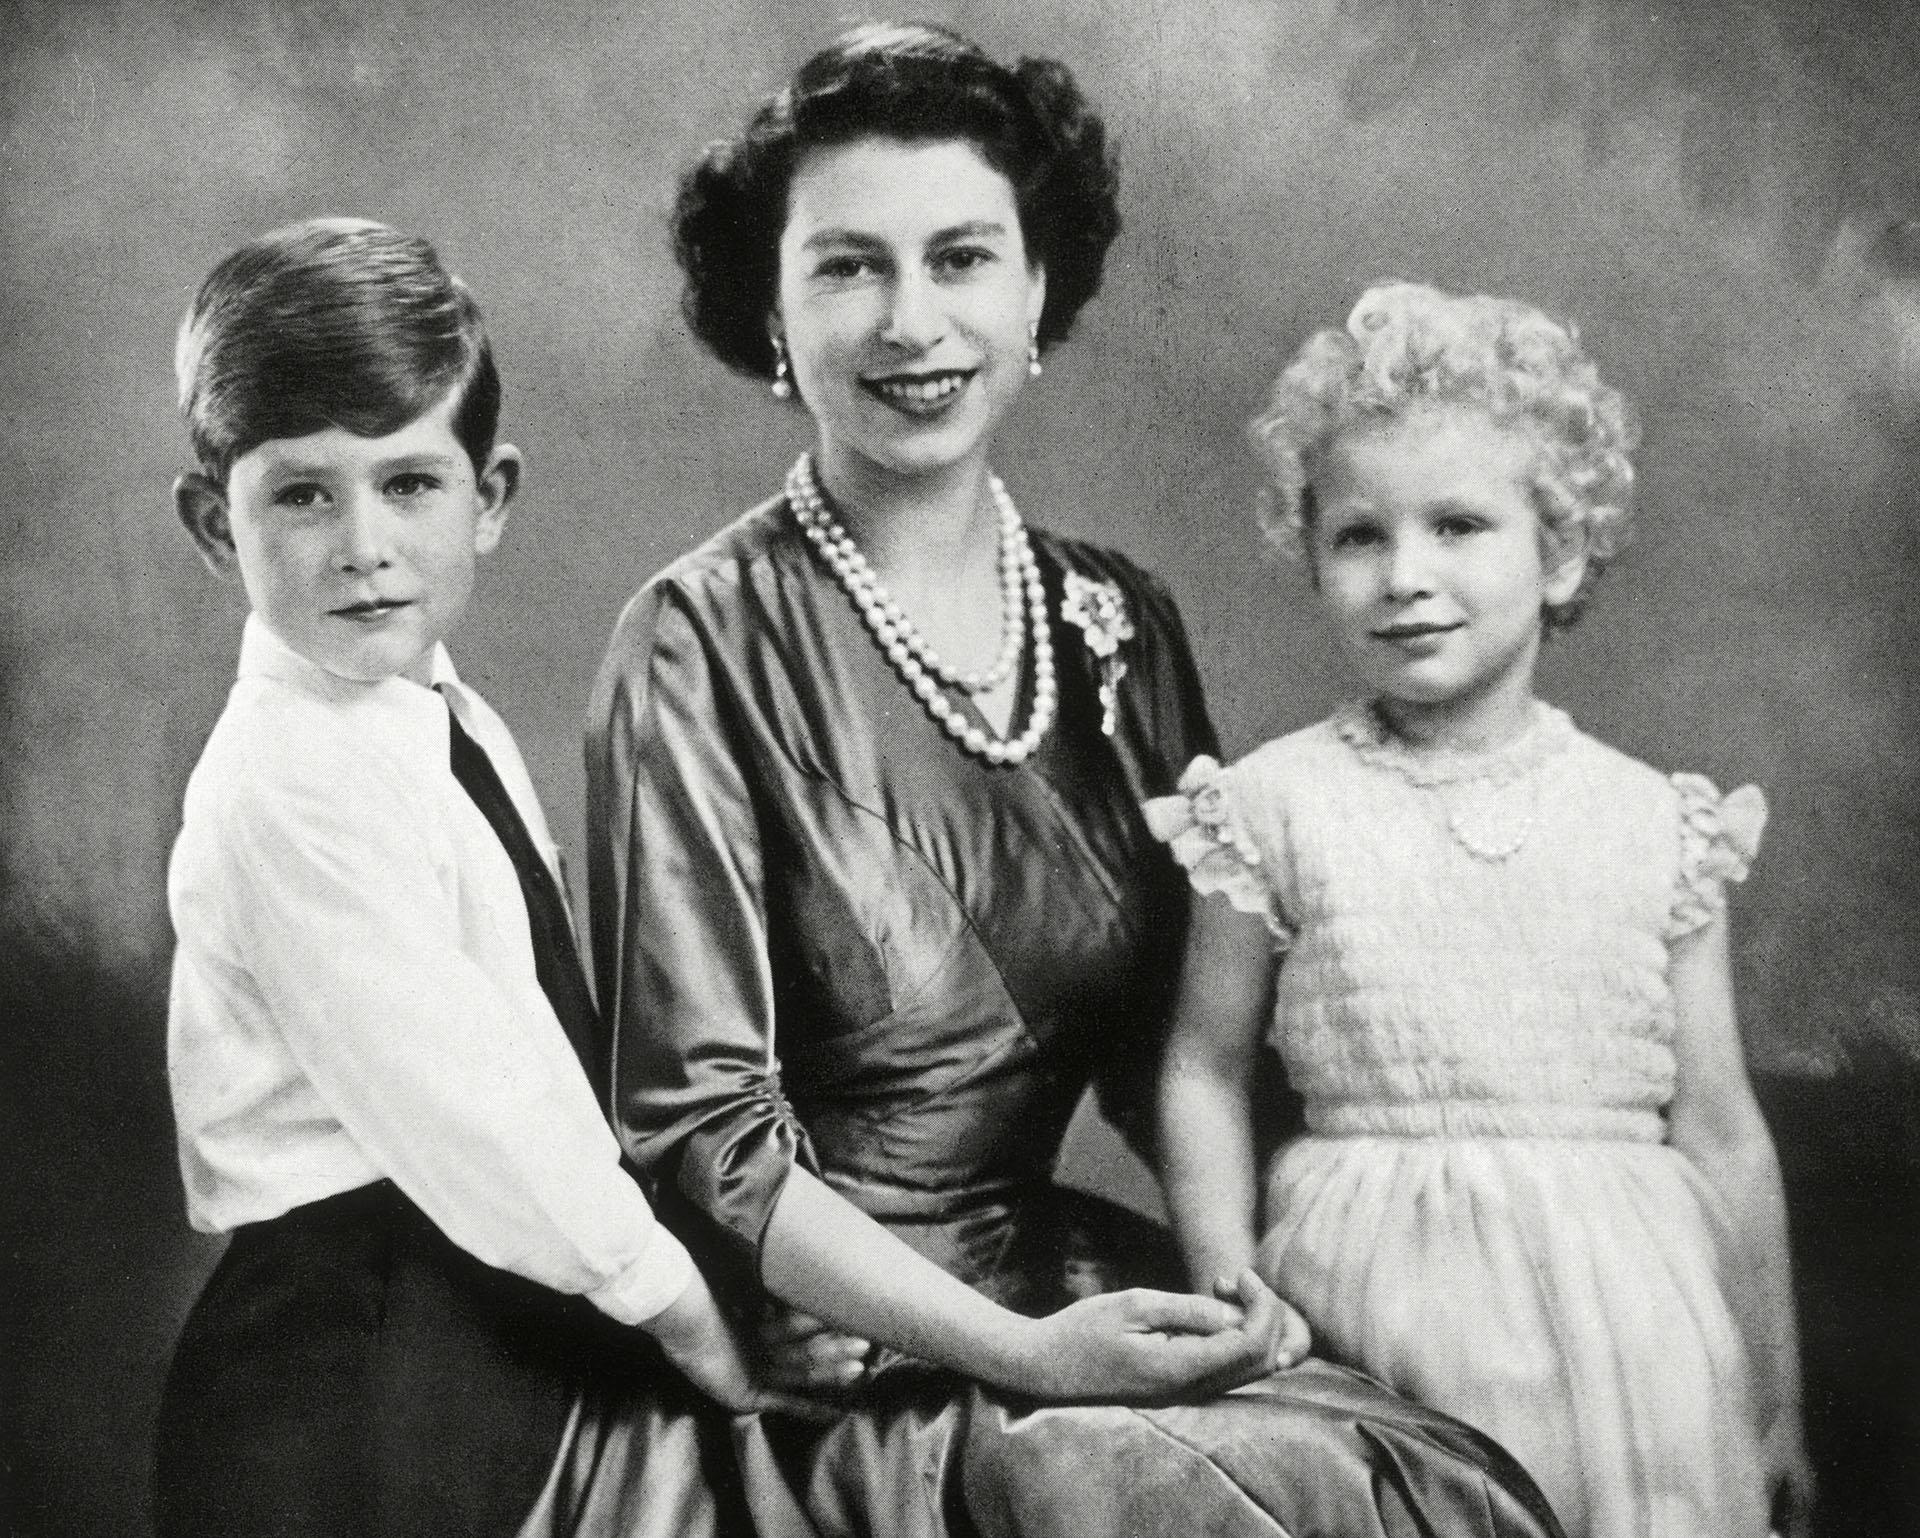 La Princesa Ana Cumple 70 Anos Un Recorrido Por La Vida De La Discreta Hija De La Reina Isabel Ii Infobae